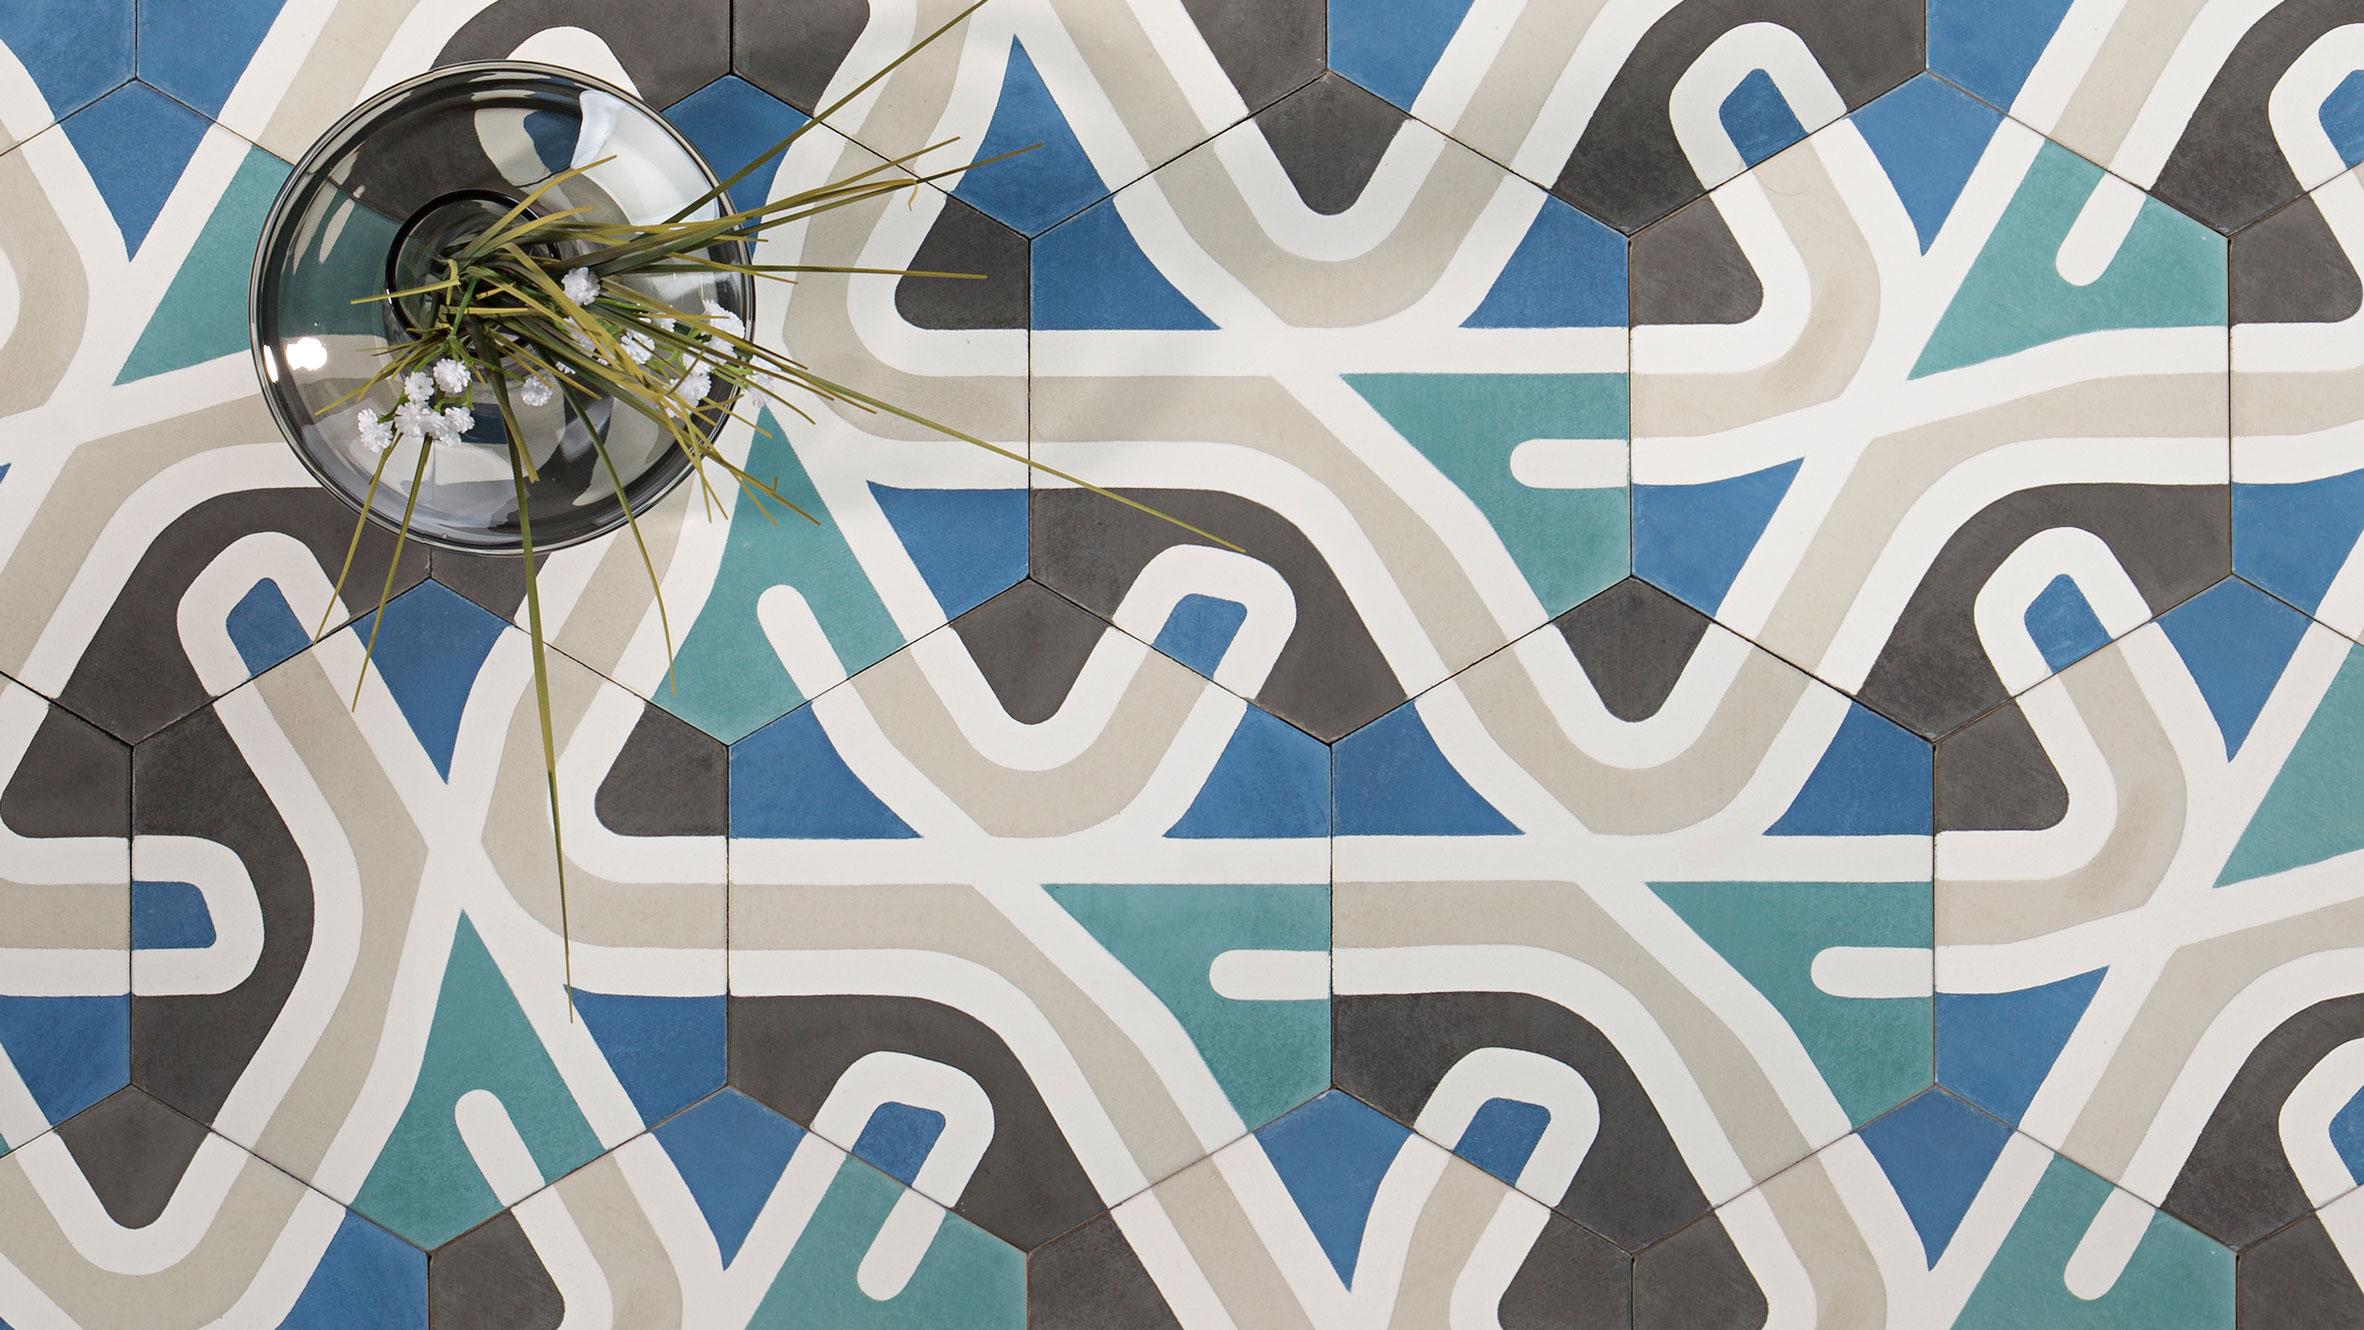 laselva-hexagonal-atlas-tiles-design-mexico_dezeen